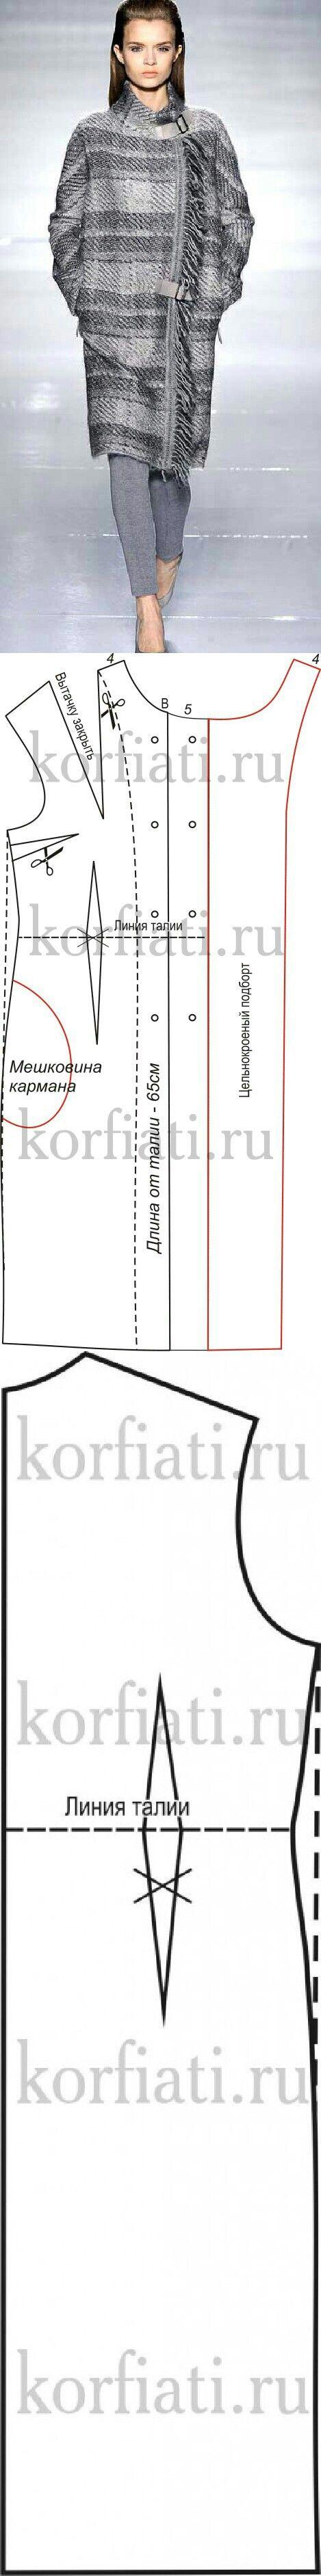 Sewing Pattern / Jacket